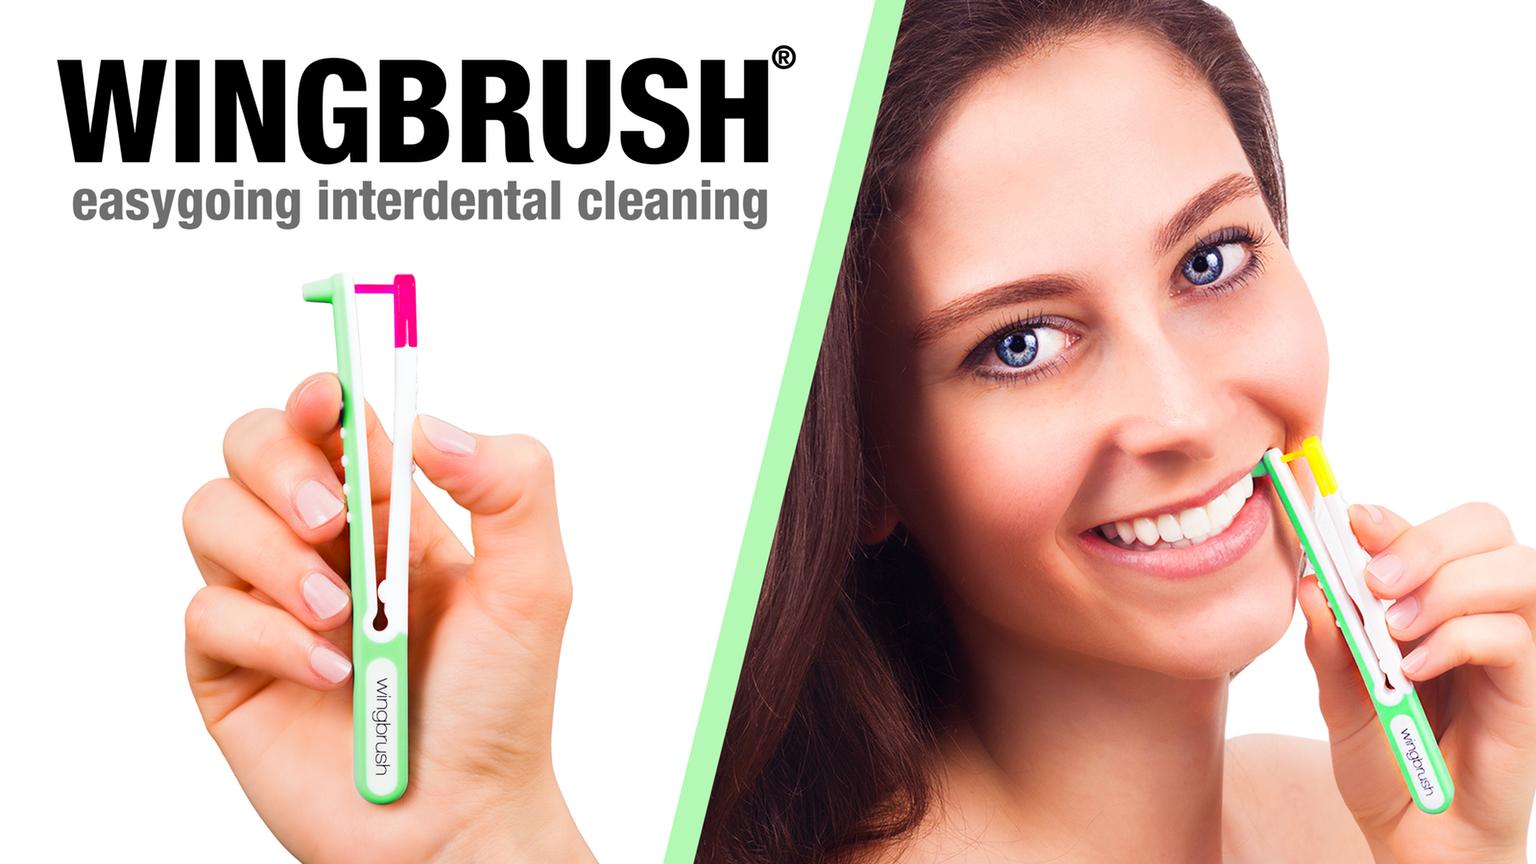 WINGBRUSH® - The revolution of interdental cleaning by Louis, Marc & Burak —Kickstarter